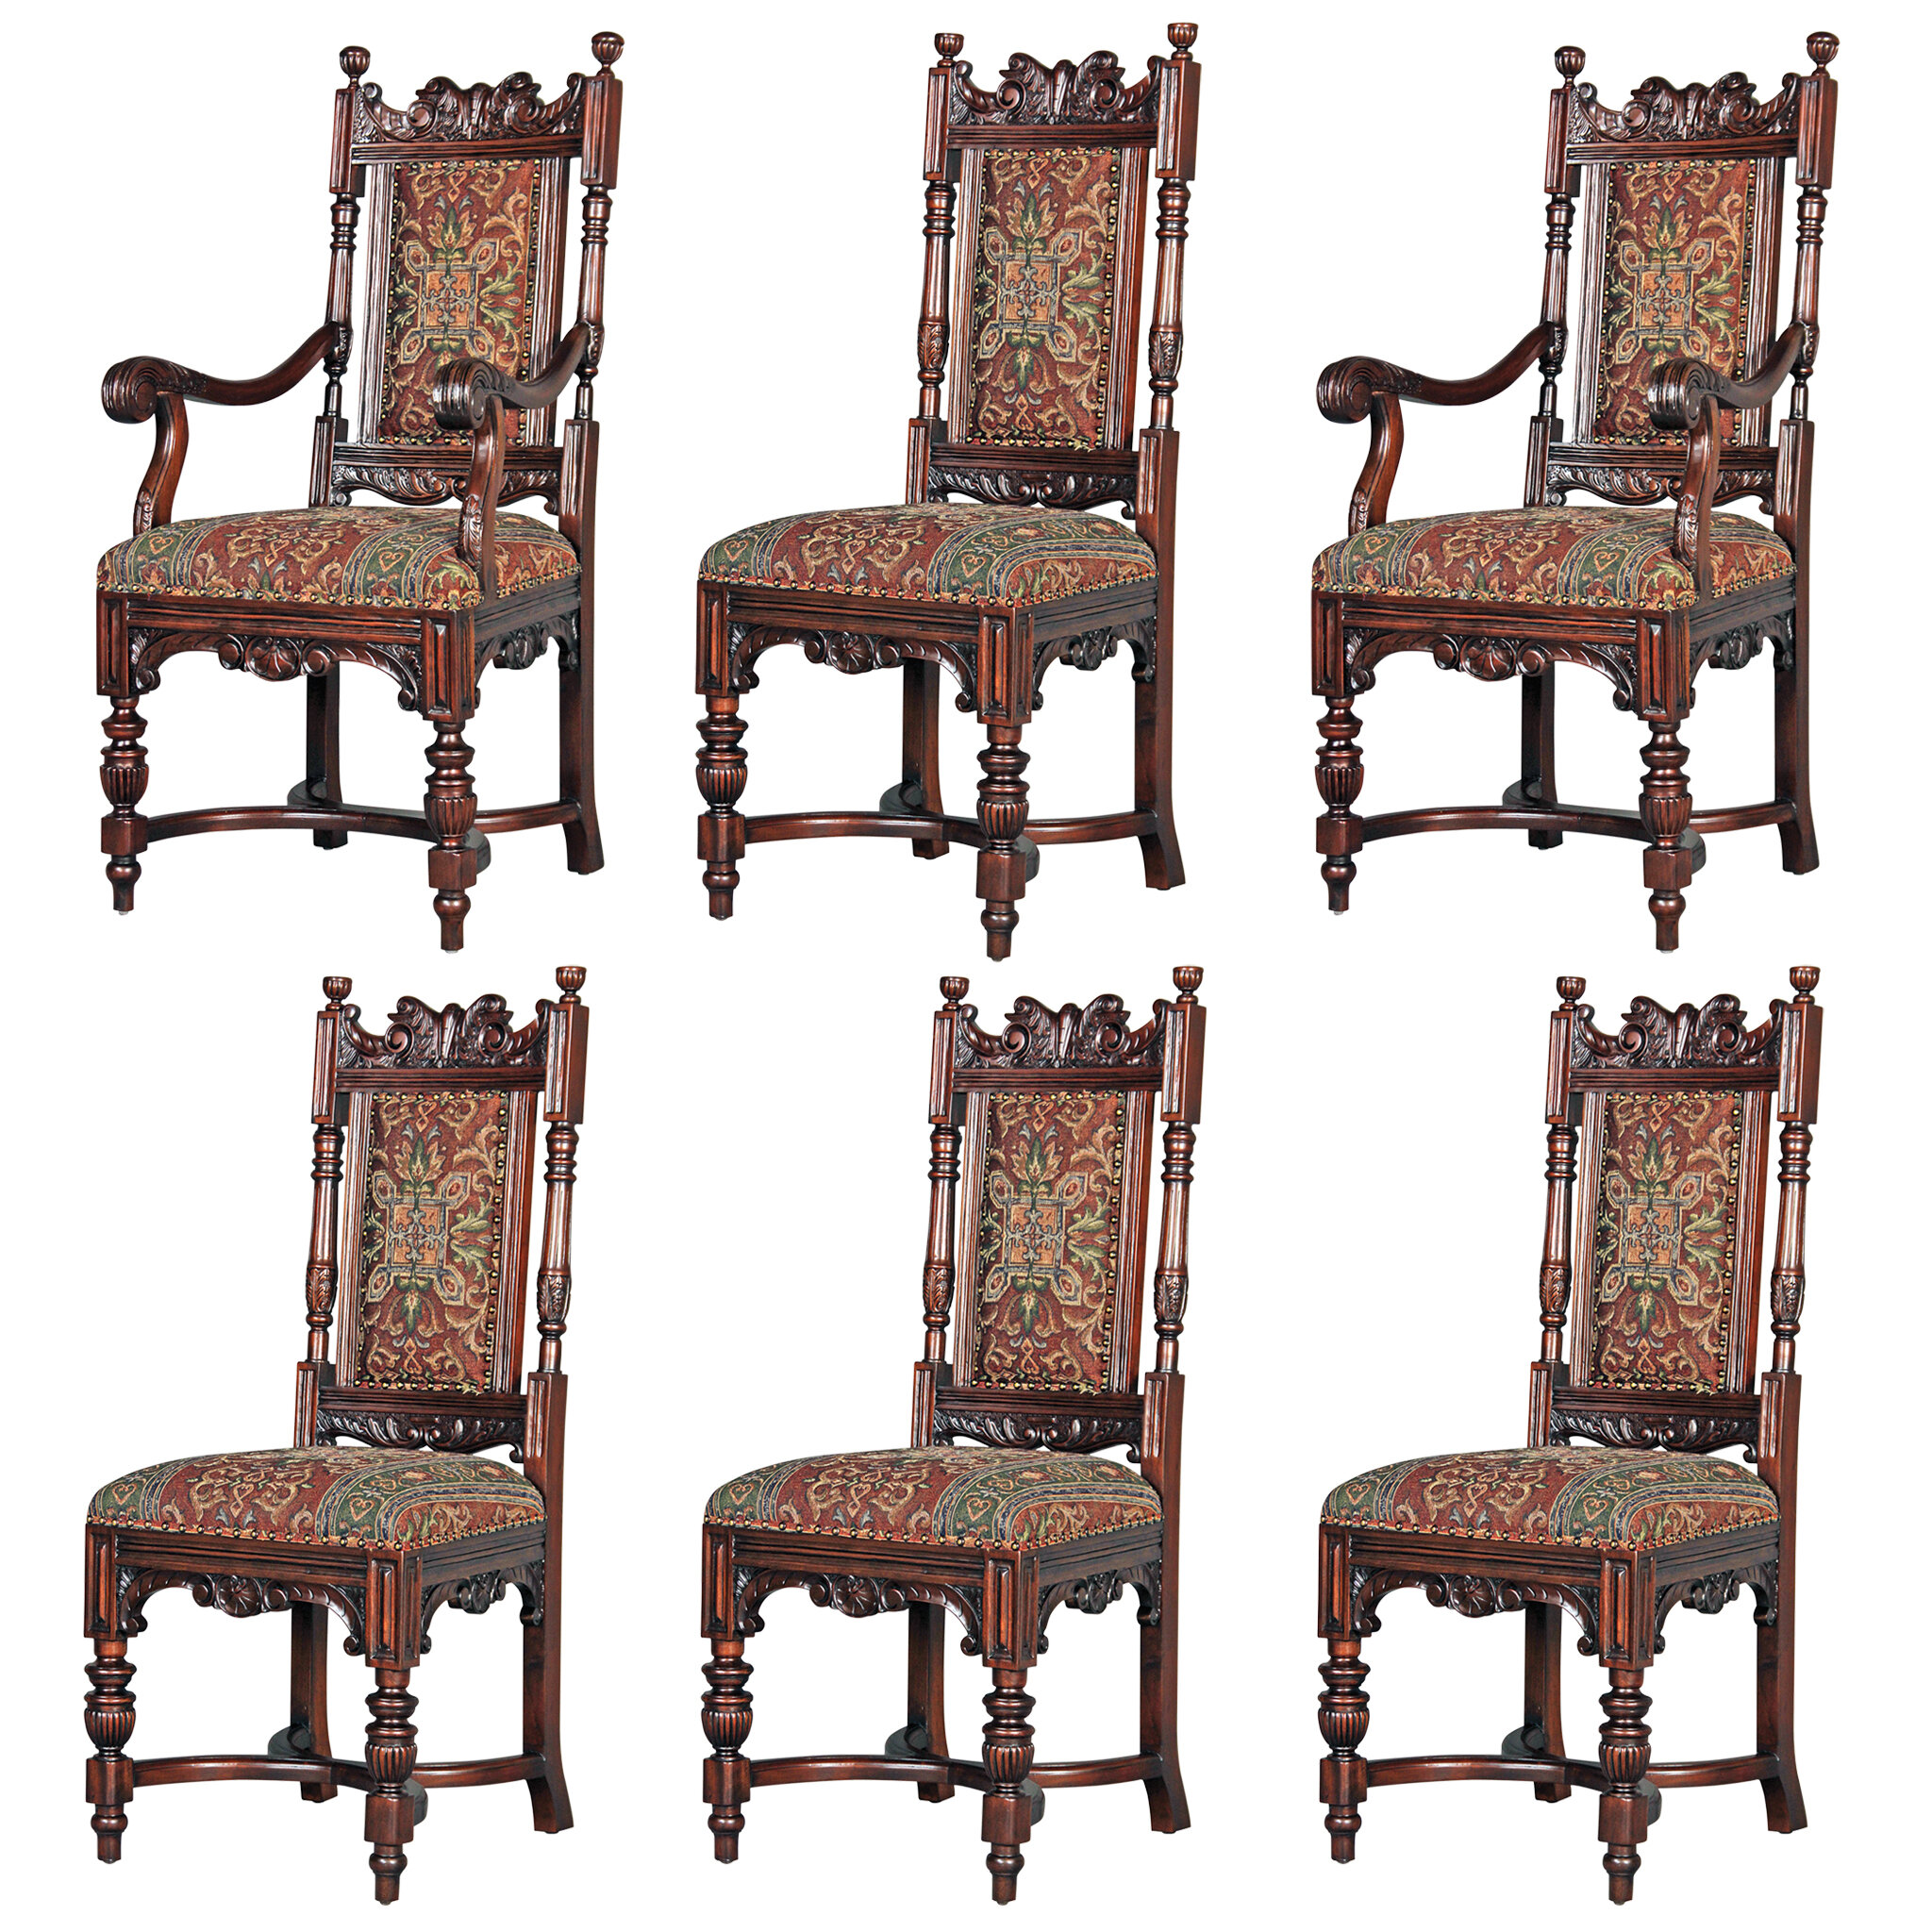 Design Toscano 6 Piece Grand Classic Edwardian Chair Set | Wayfair